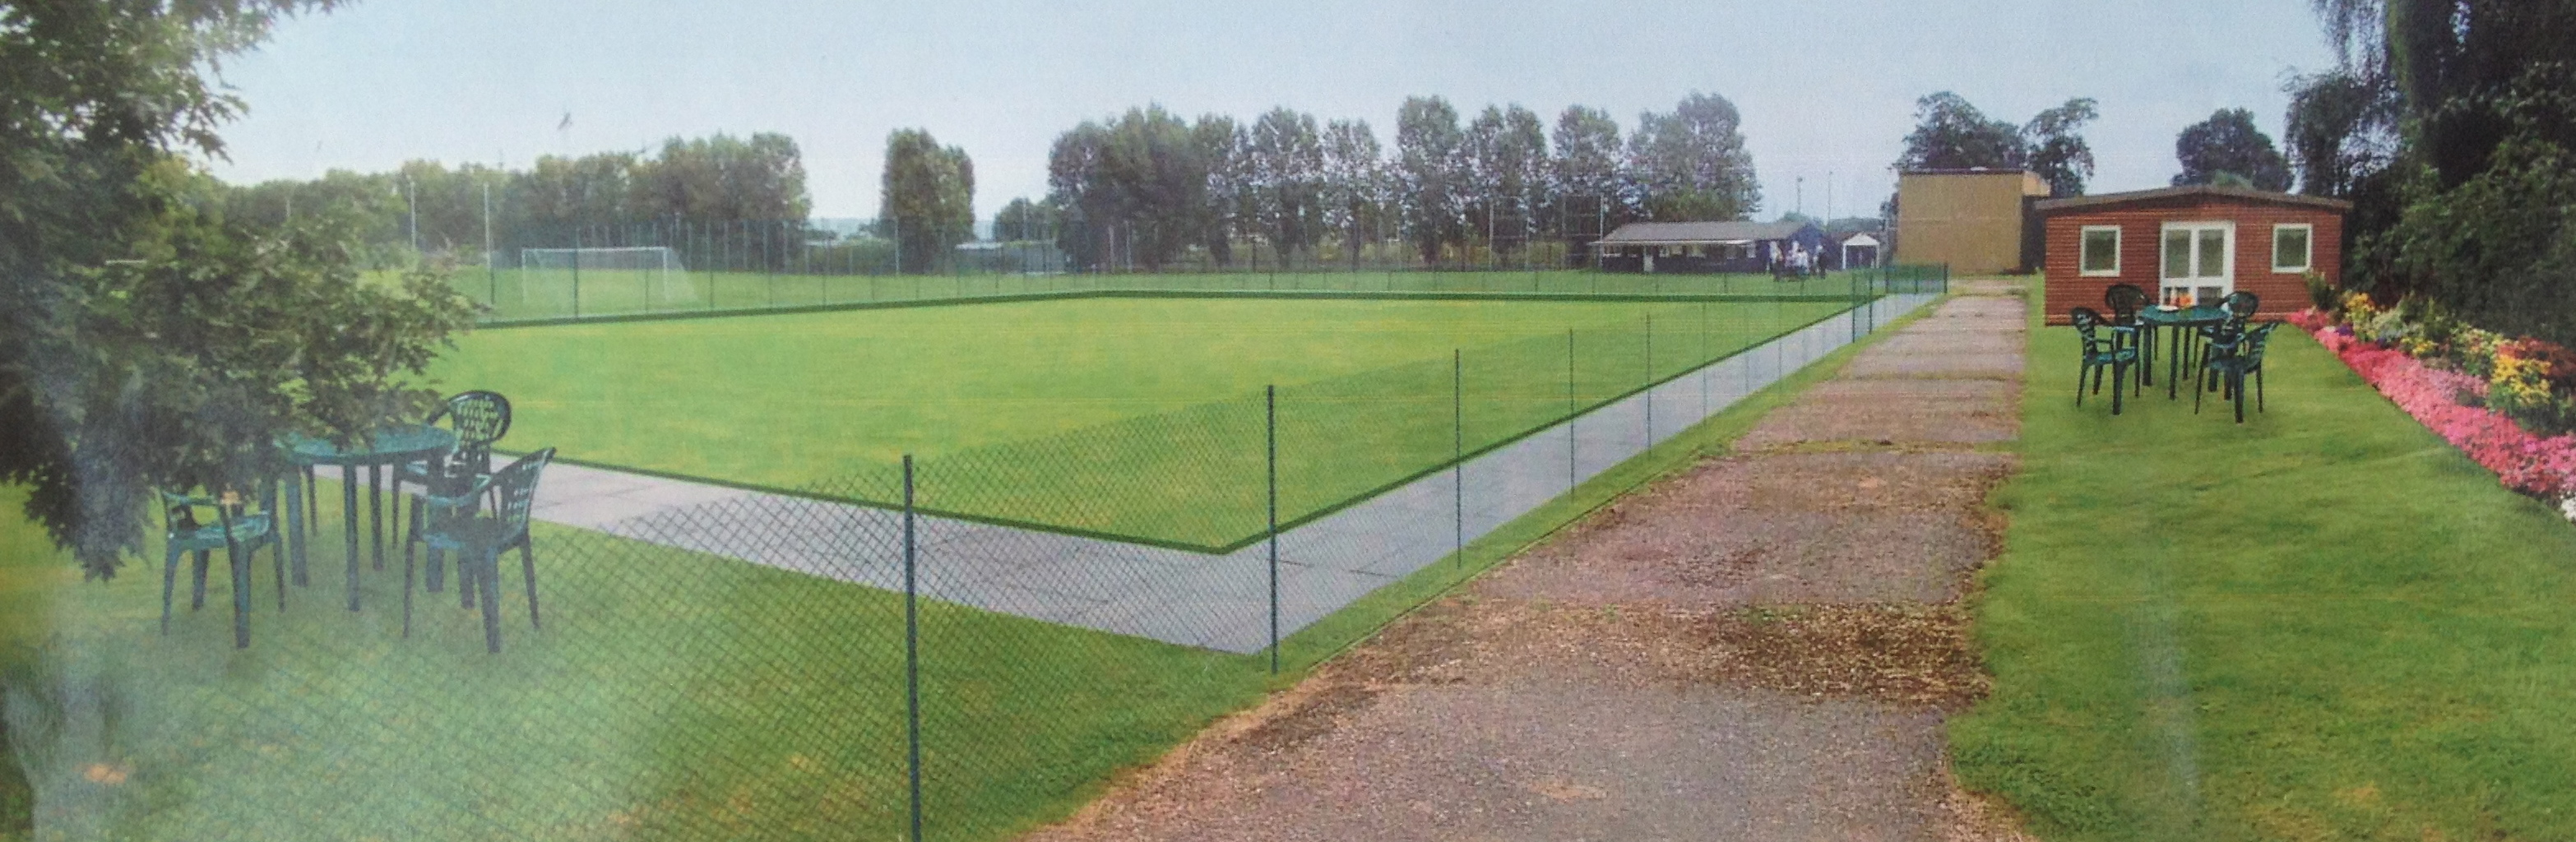 New Club Development